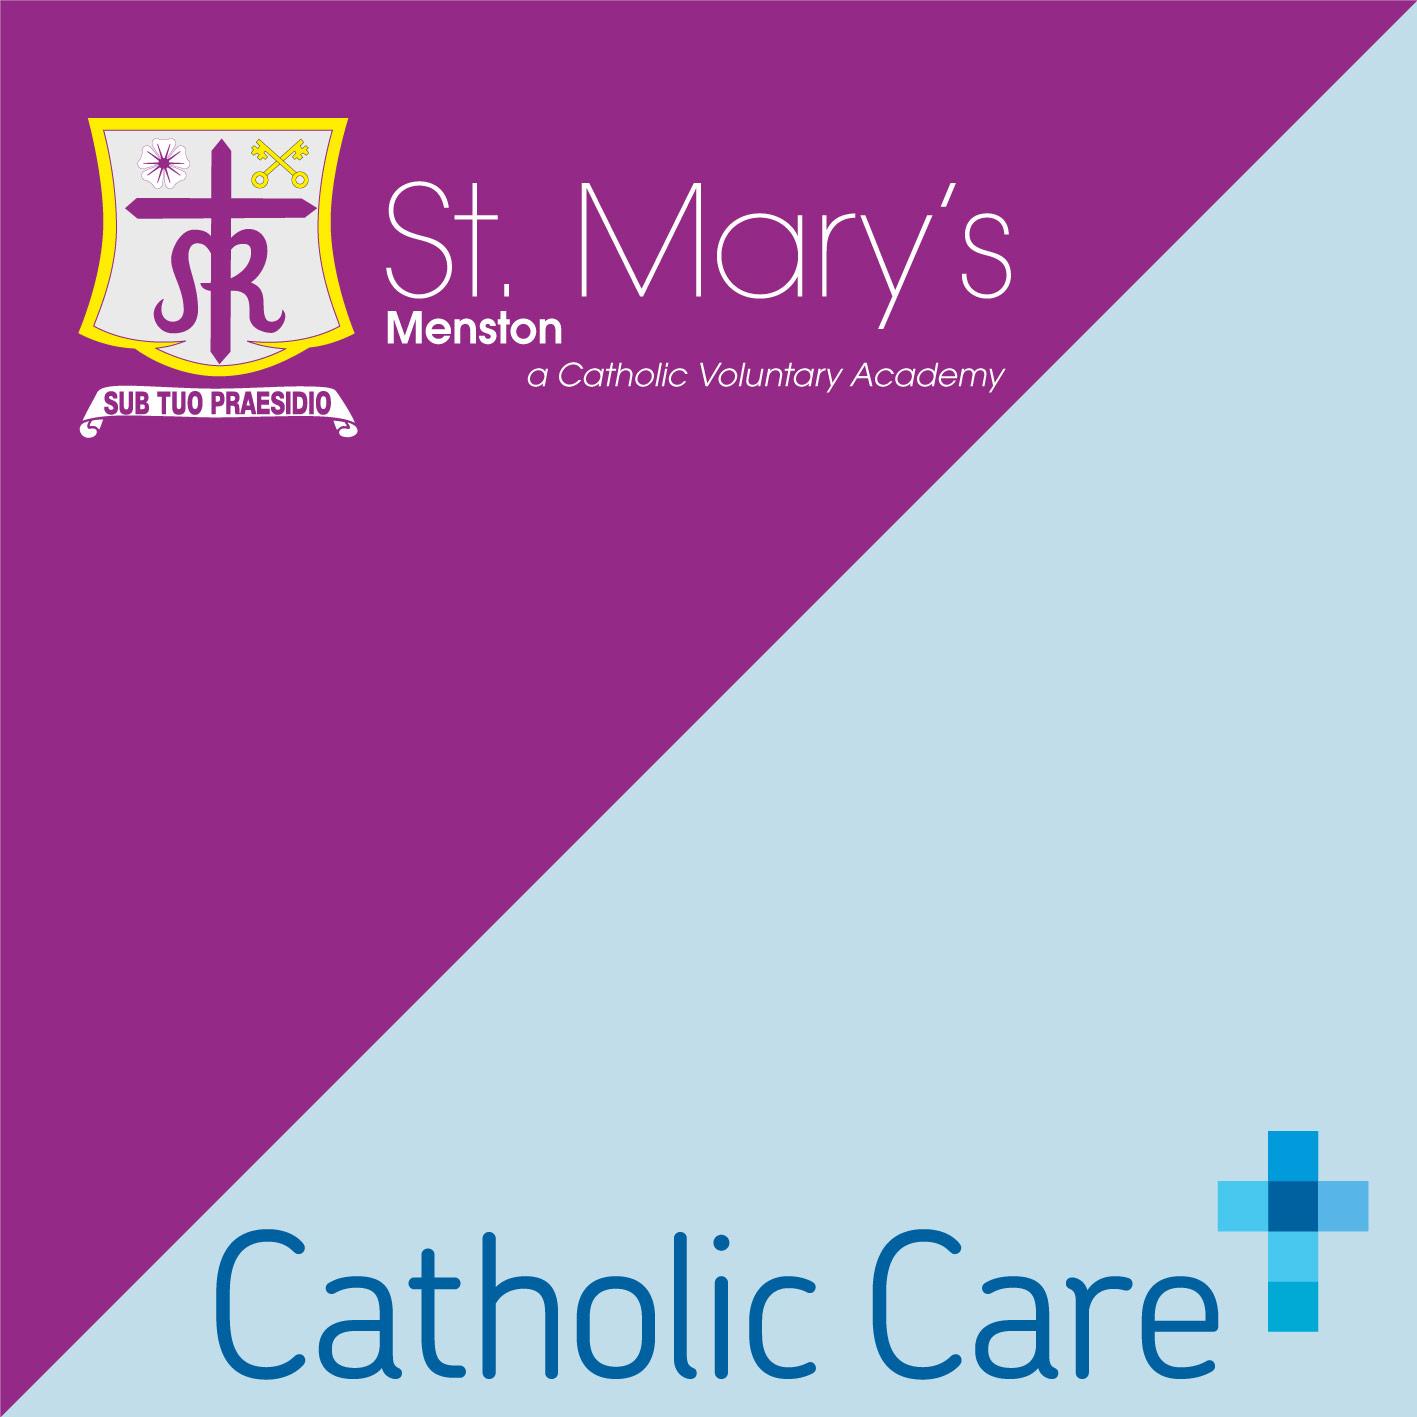 Catholic-Care-news-stoyr-image.jpg